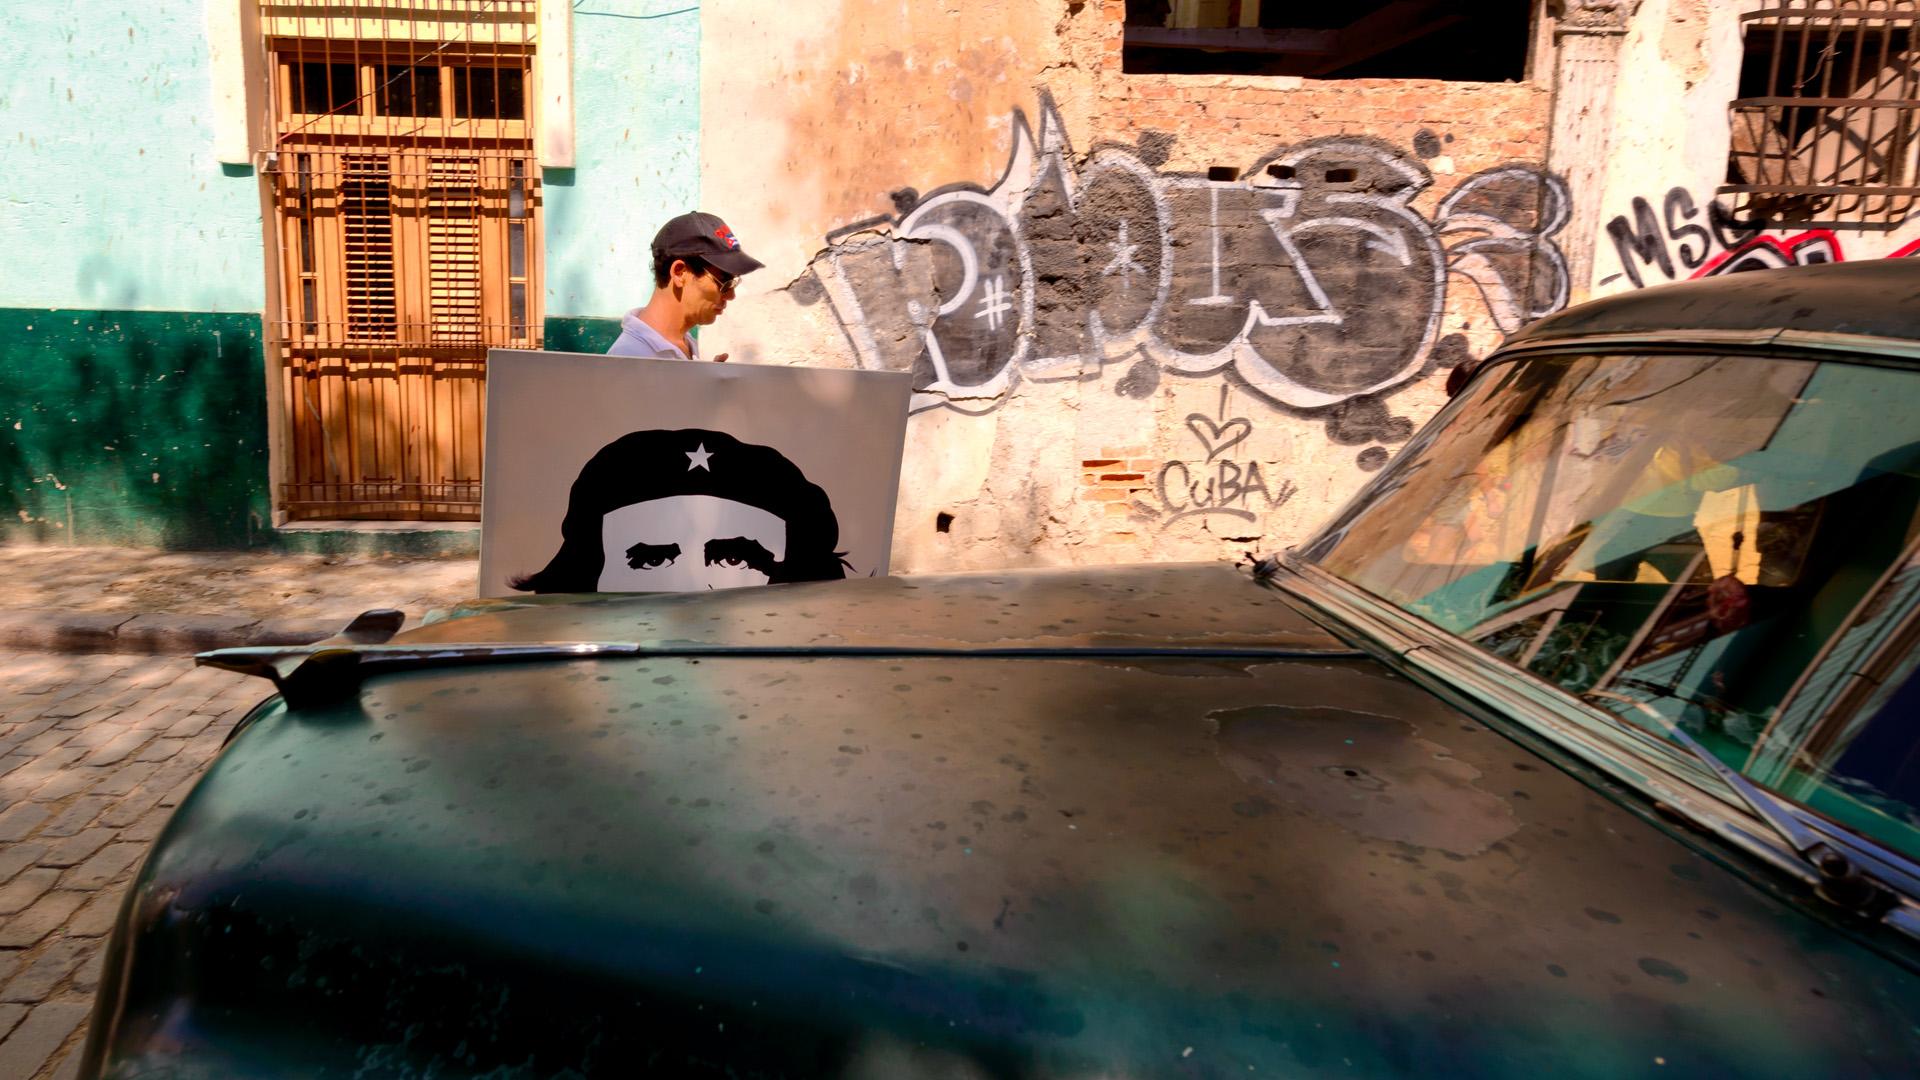 Havana_Che Guevara